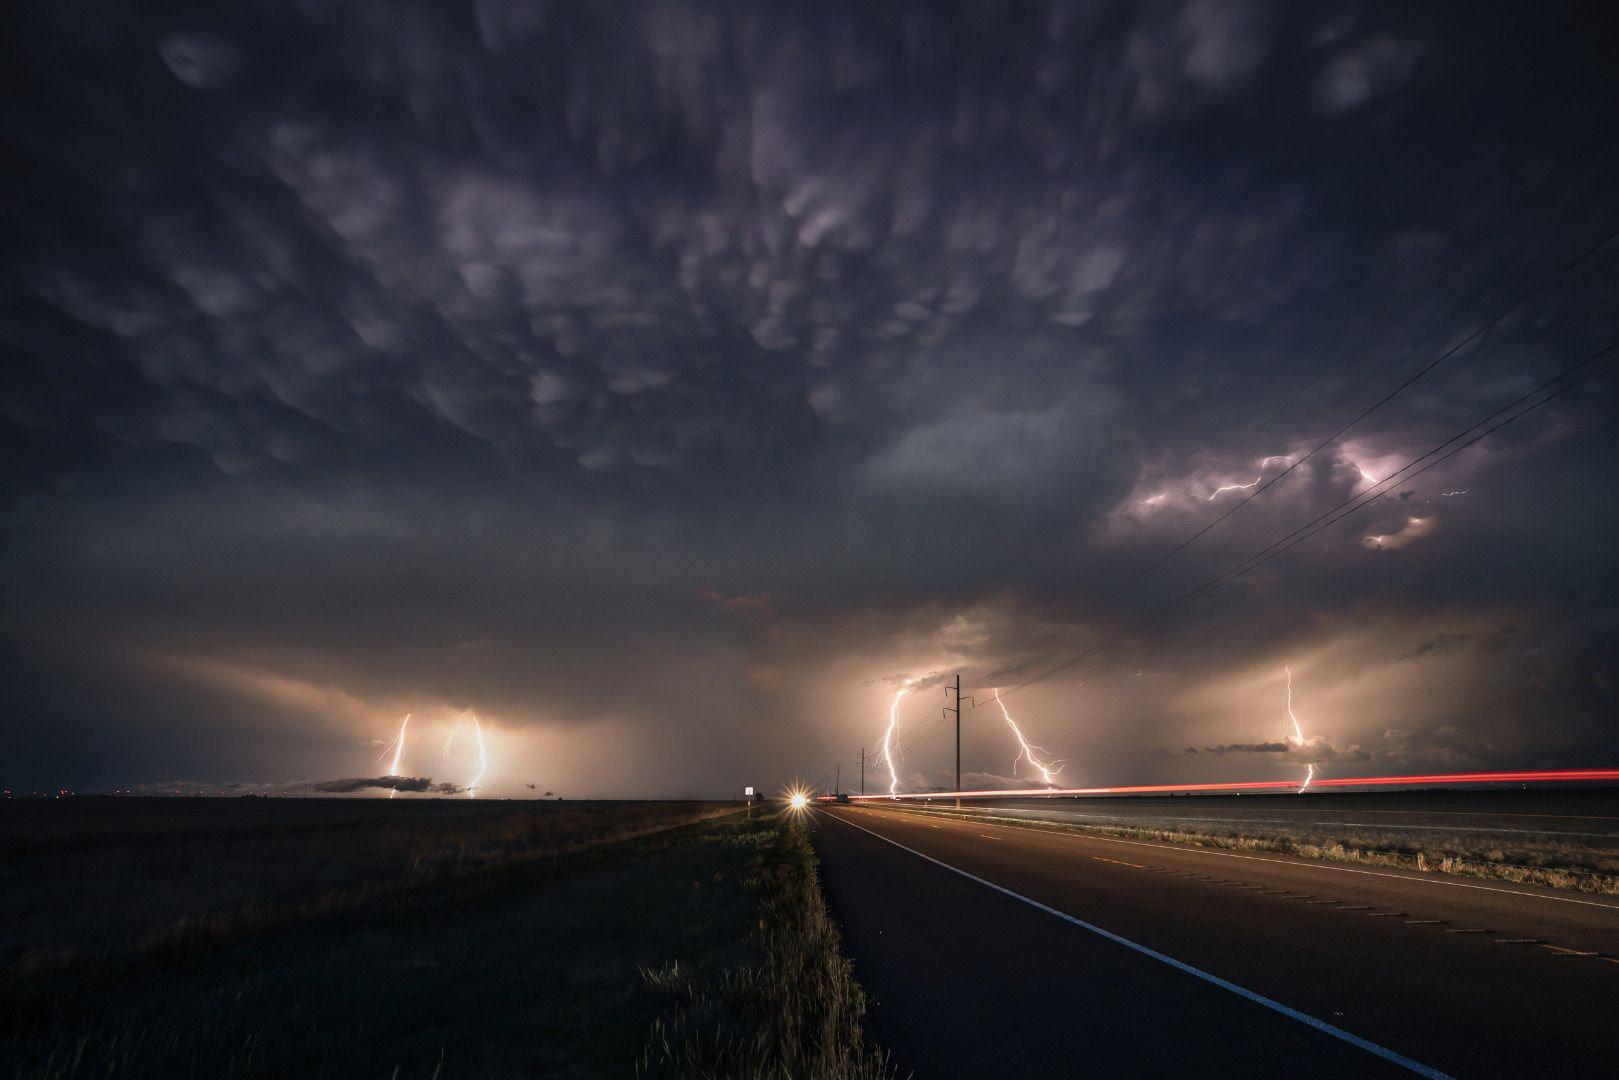 Драматургия на равнинах, © Джейсон Хадсон, Фотоконкурс «Погодный фотограф года» — Weather Photographer of the Year